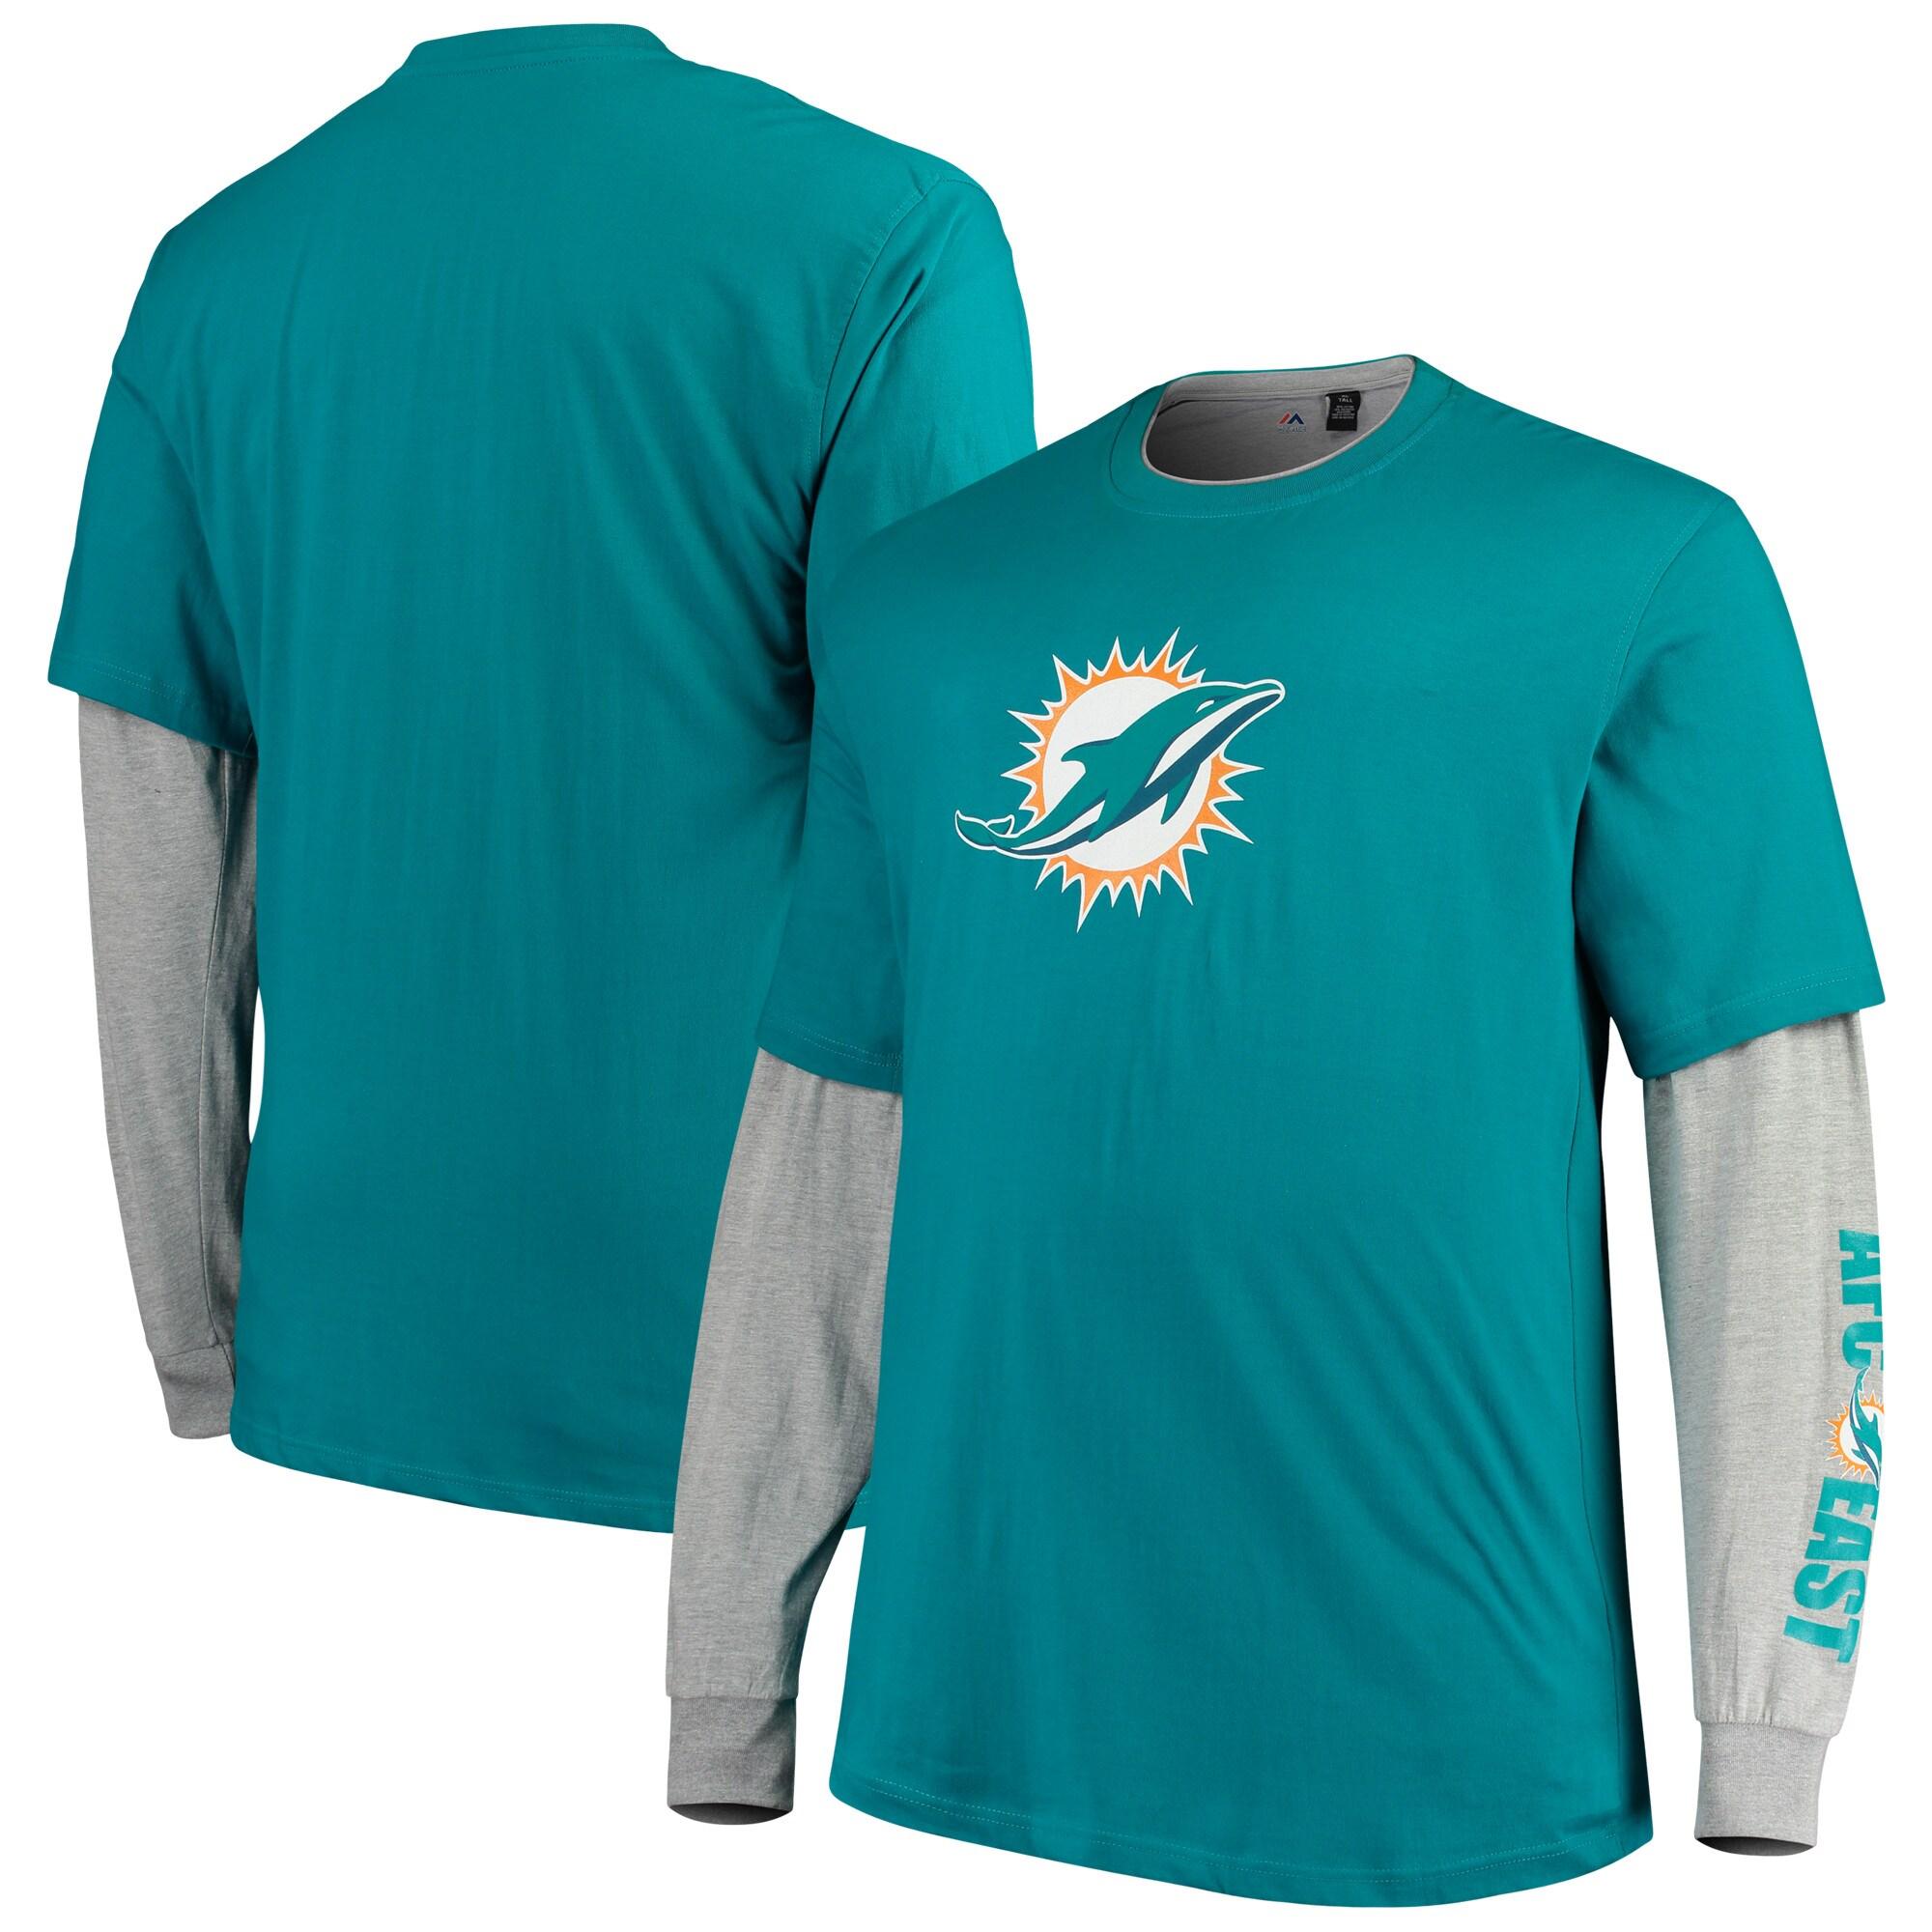 Miami Dolphins Majestic Big & Tall T-Shirt Combo Set - Aqua/Heathered Gray